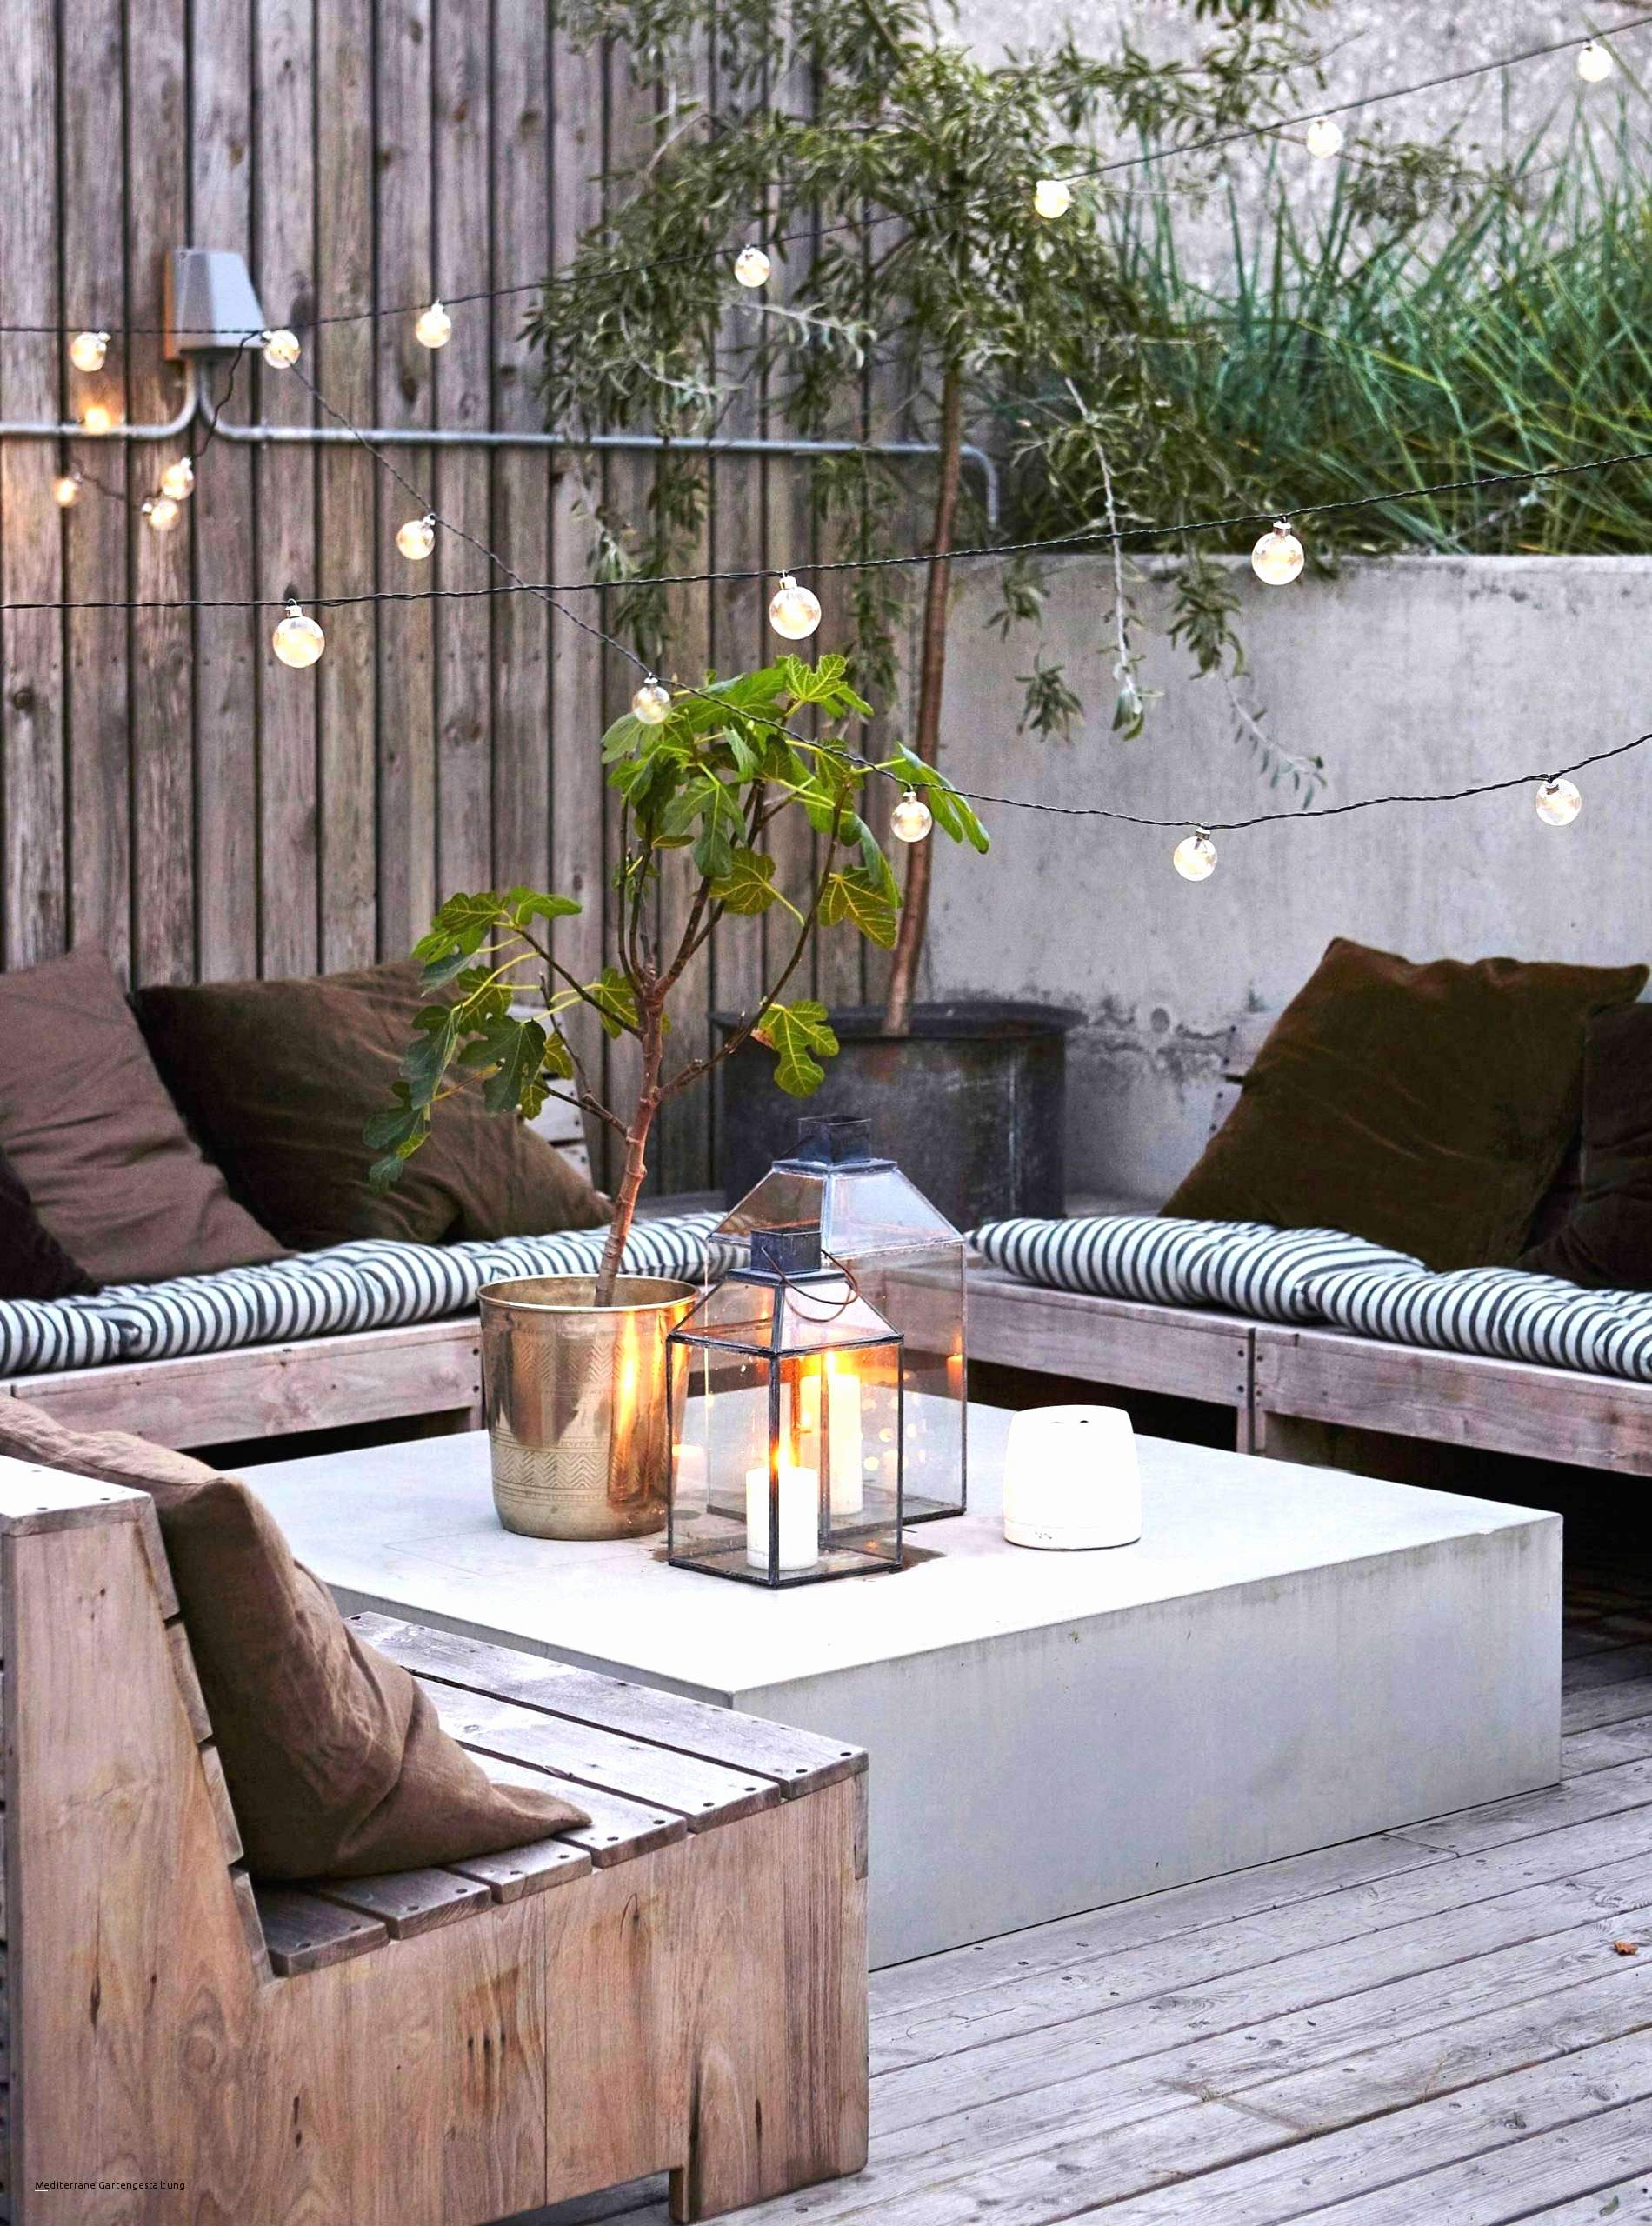 elegant garden design picture of garten design ideen elegant garten pflanzen gartenpflanzen 0d of elegant garden design